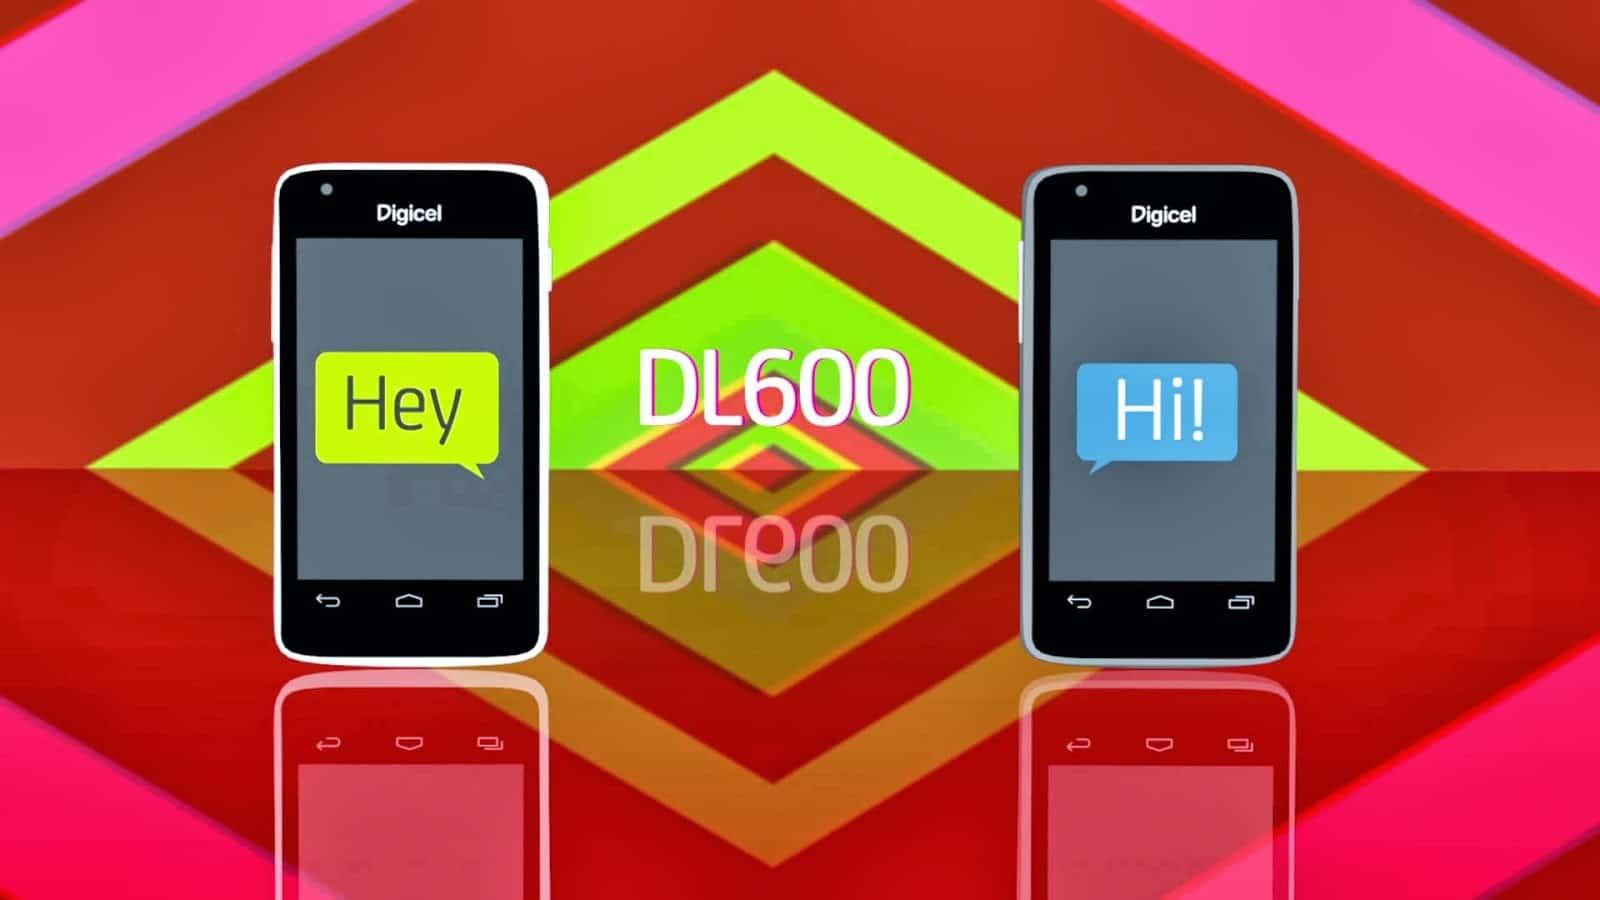 Digicel DL600